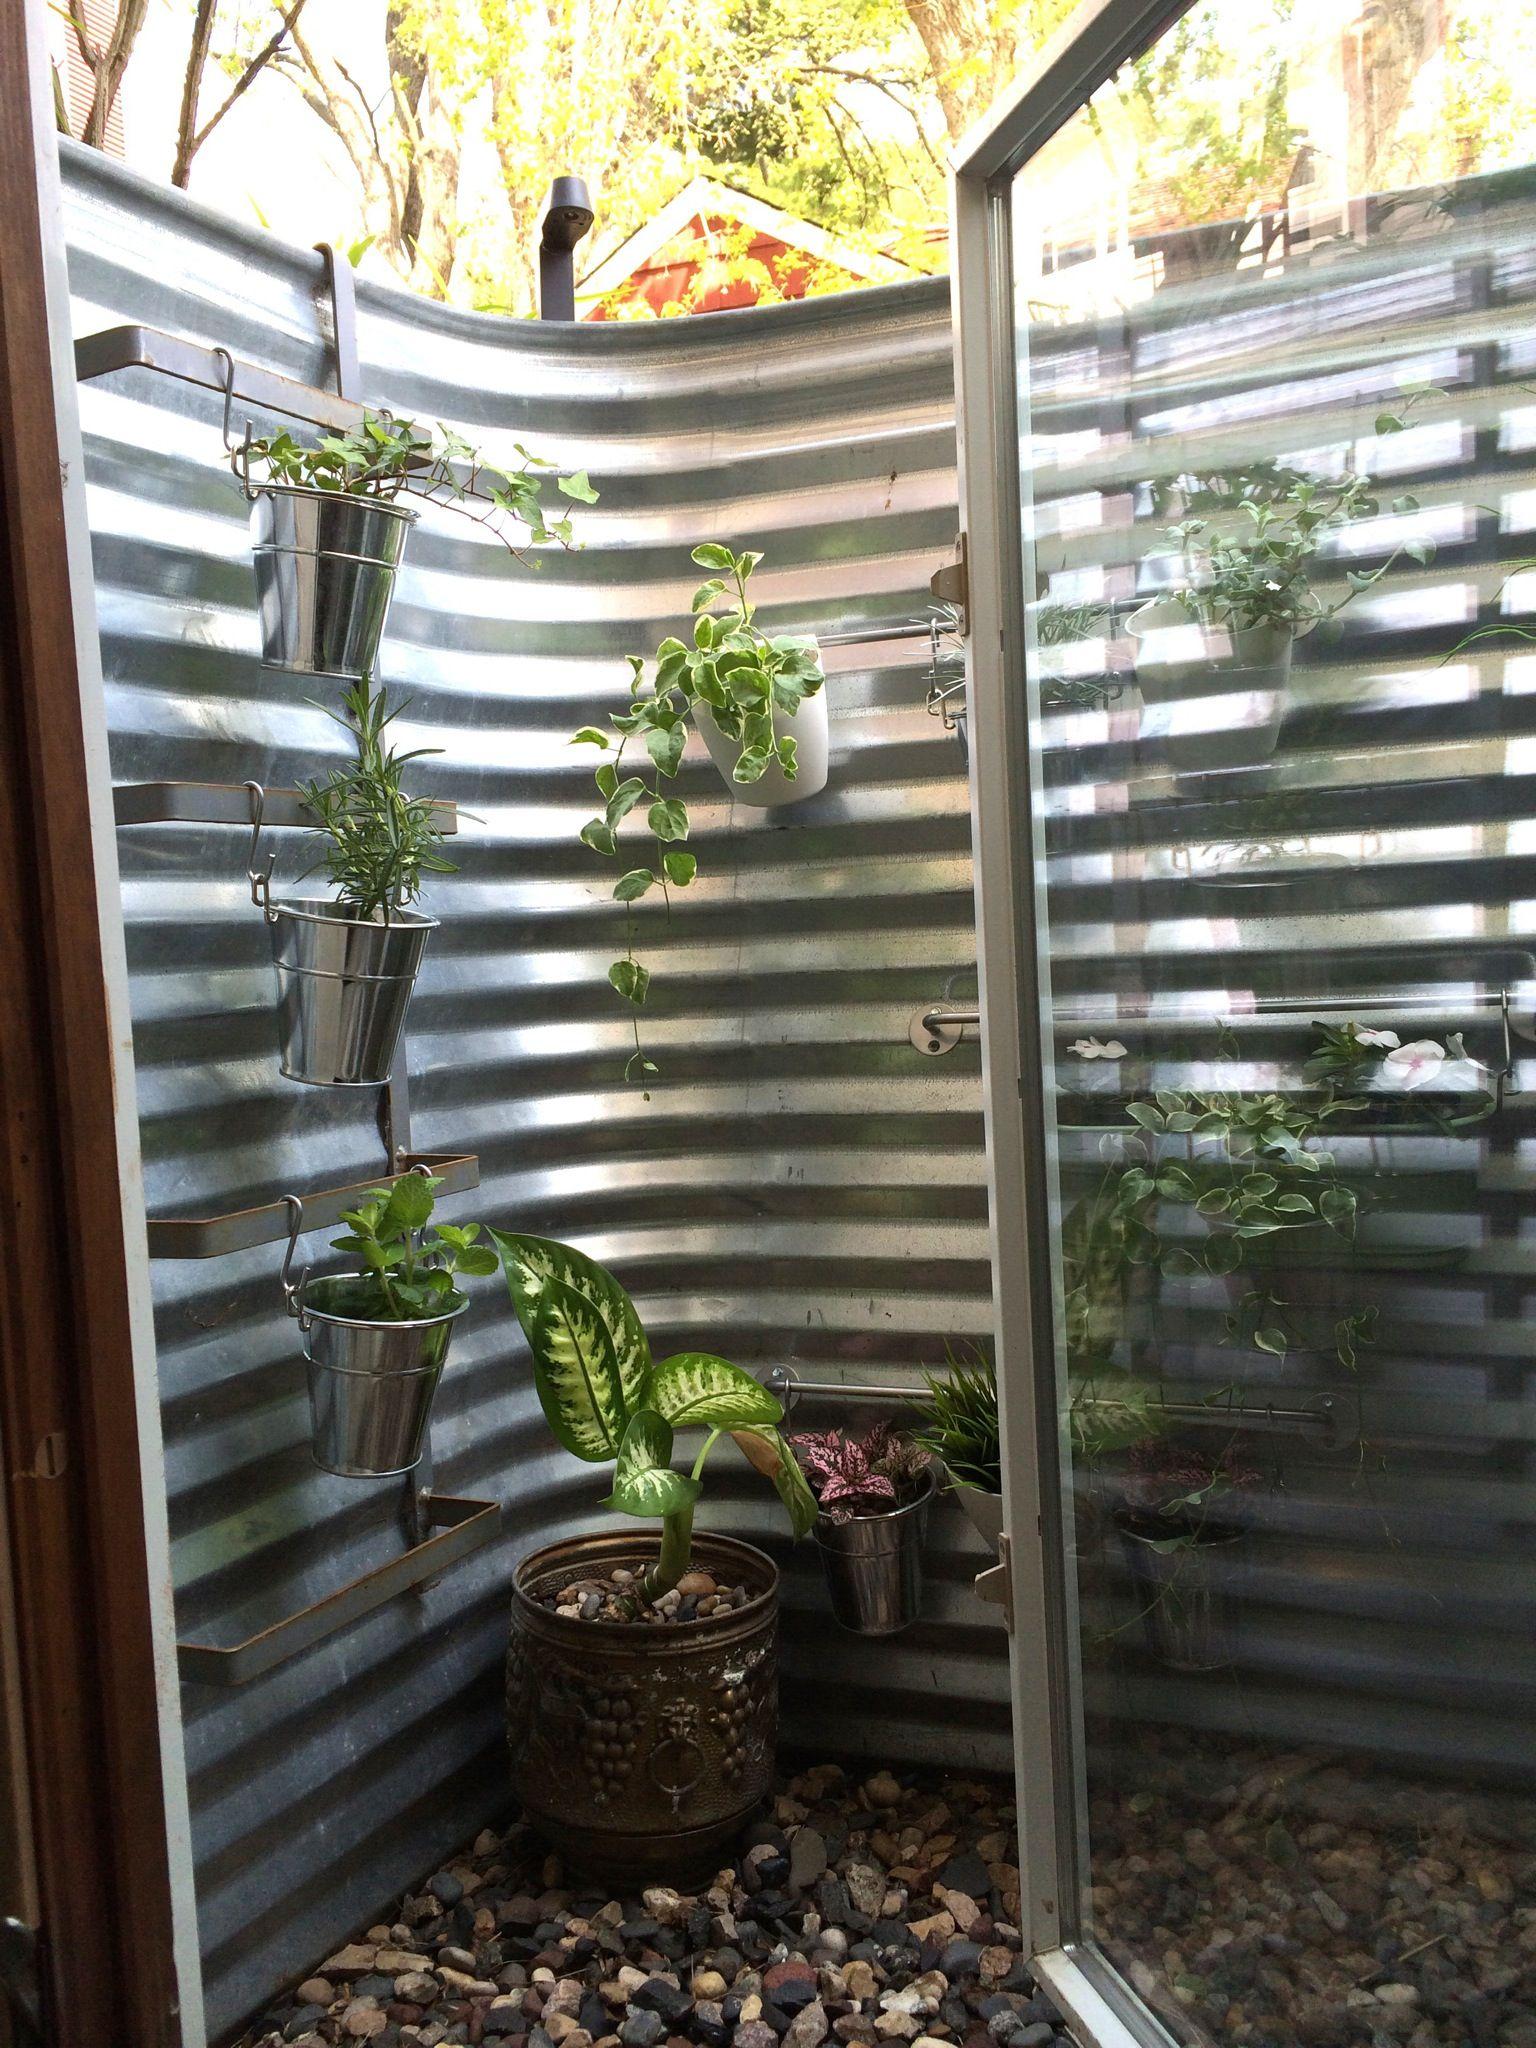 How to Beautify an Egress Window Recipe